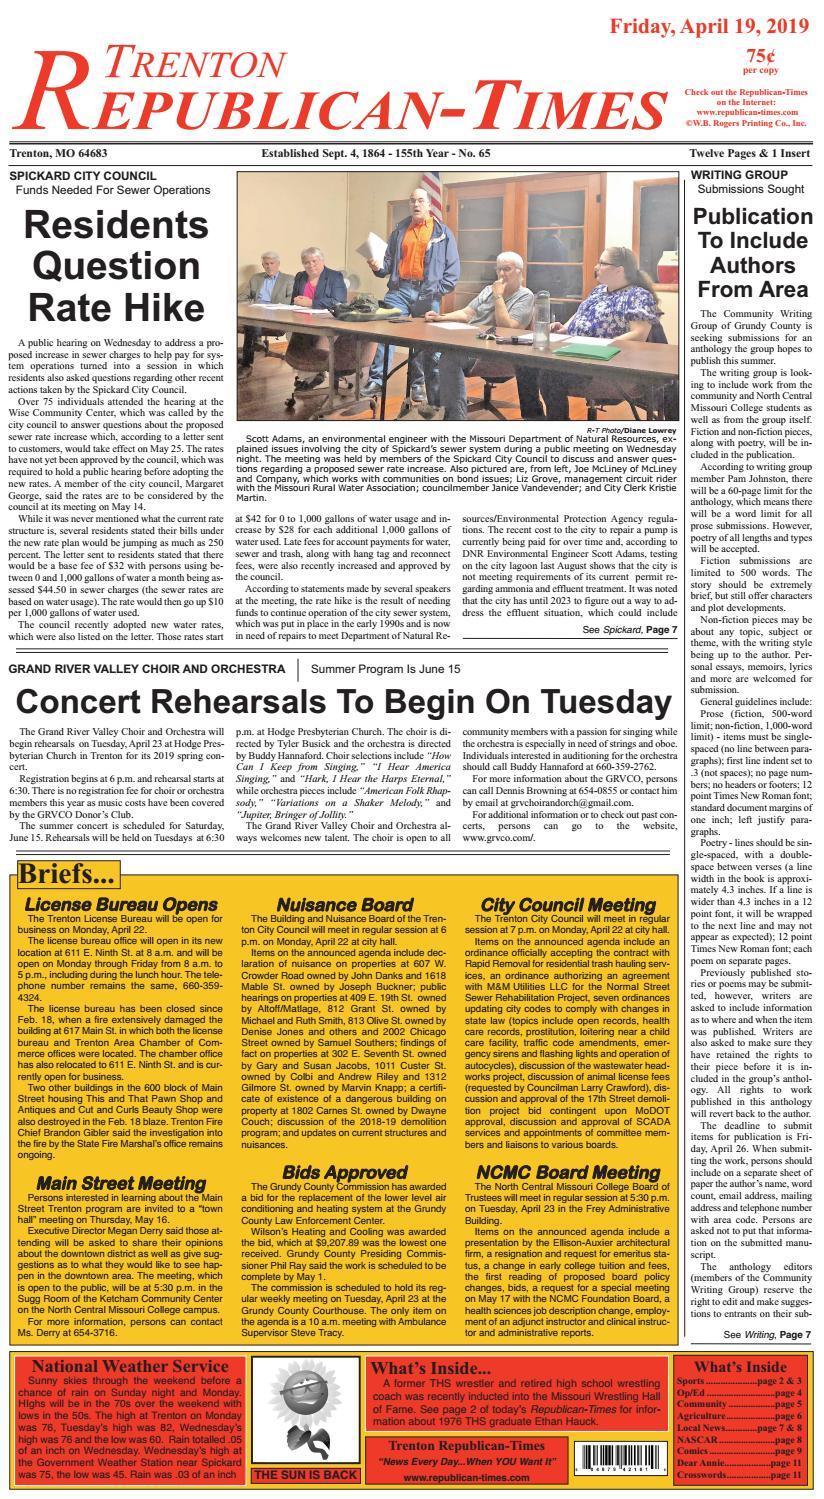 Trenton Republican Times 4-19-19 by Gallatin Publishing